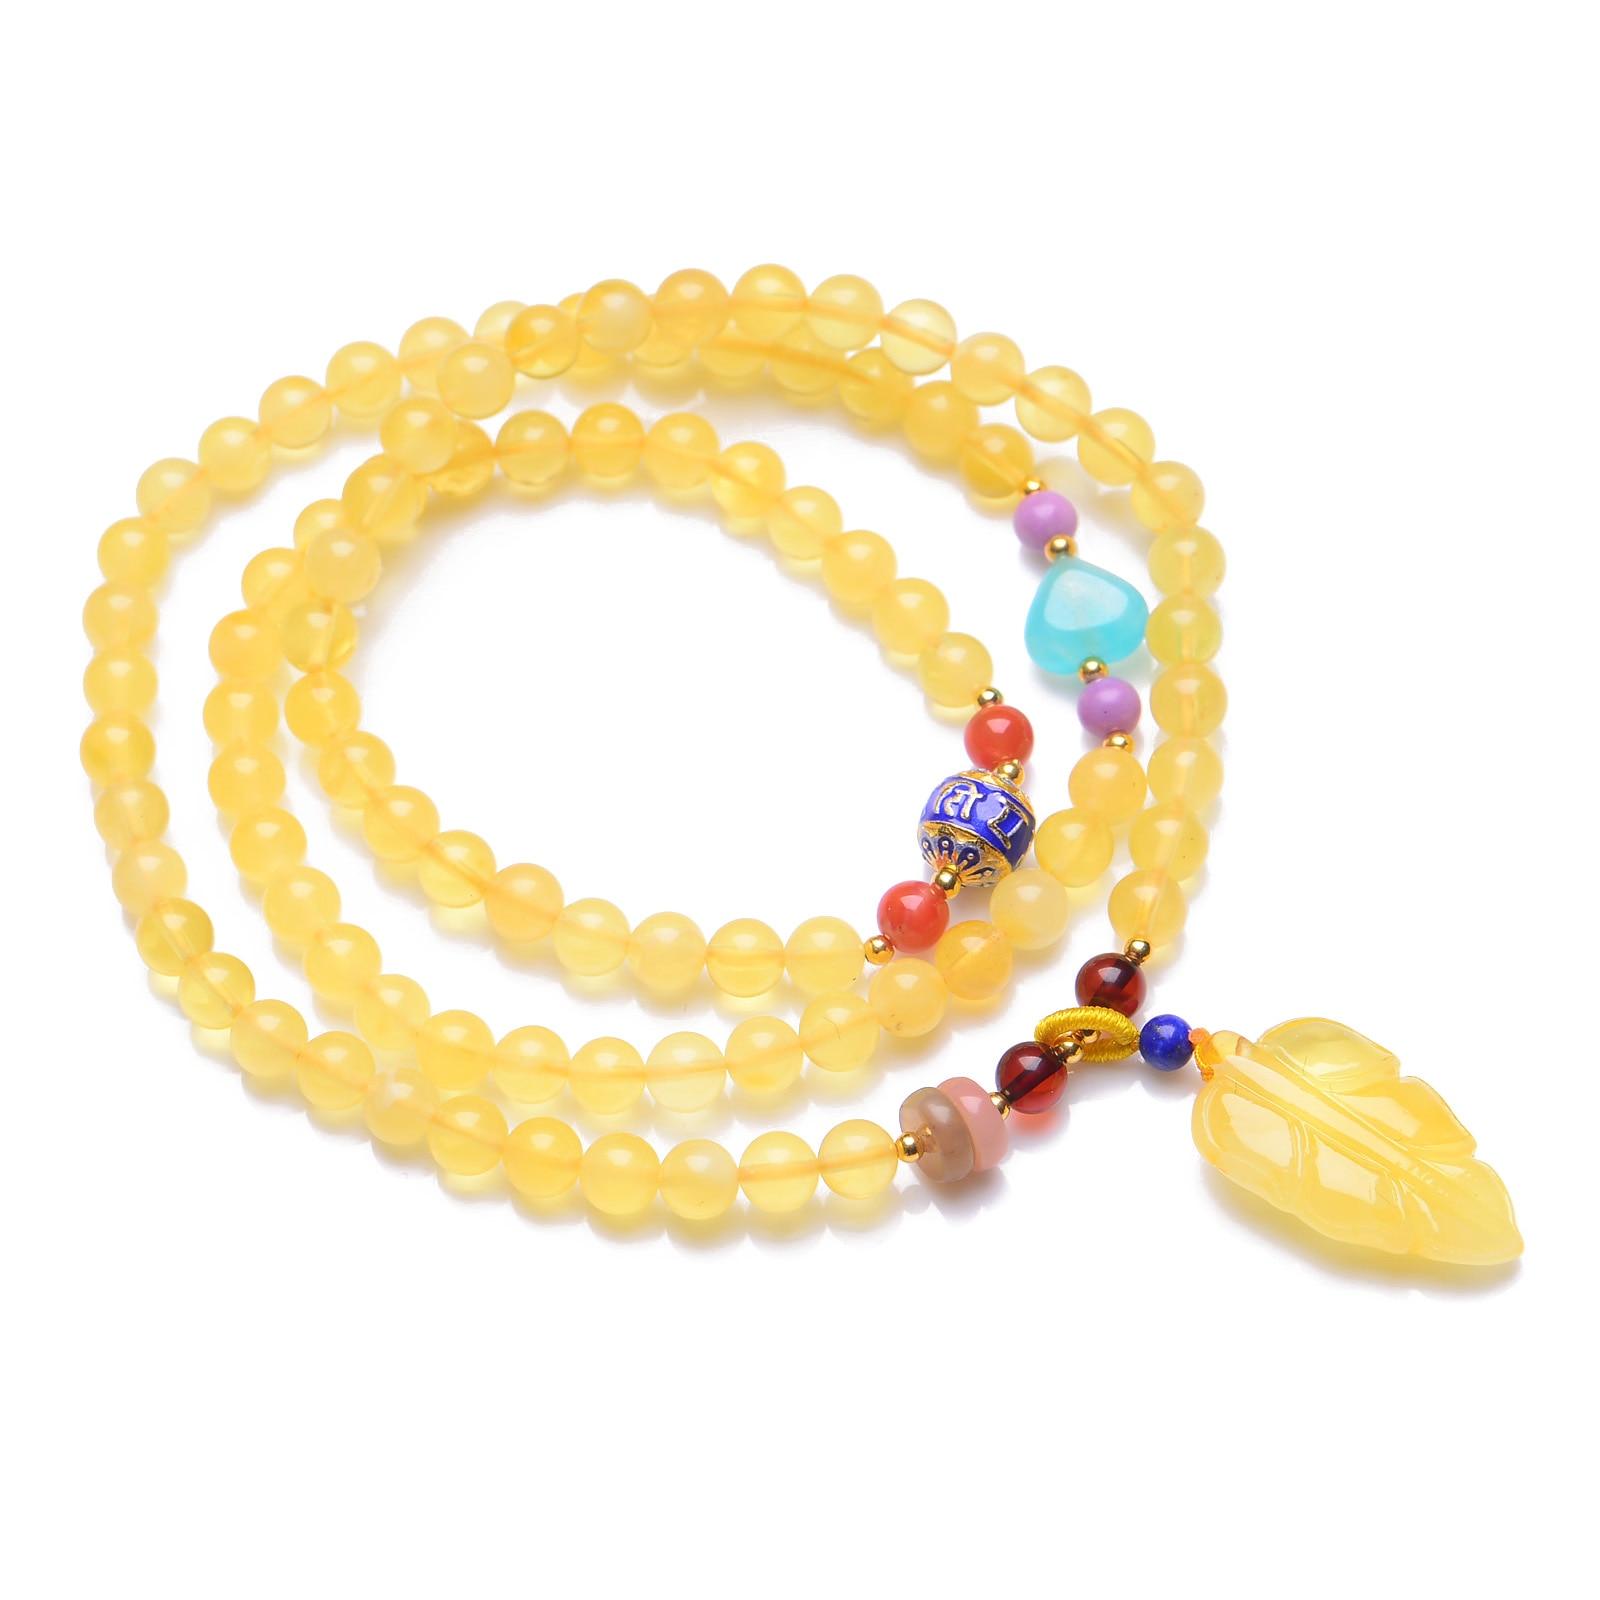 Handmade Authentic Wax Bracelets